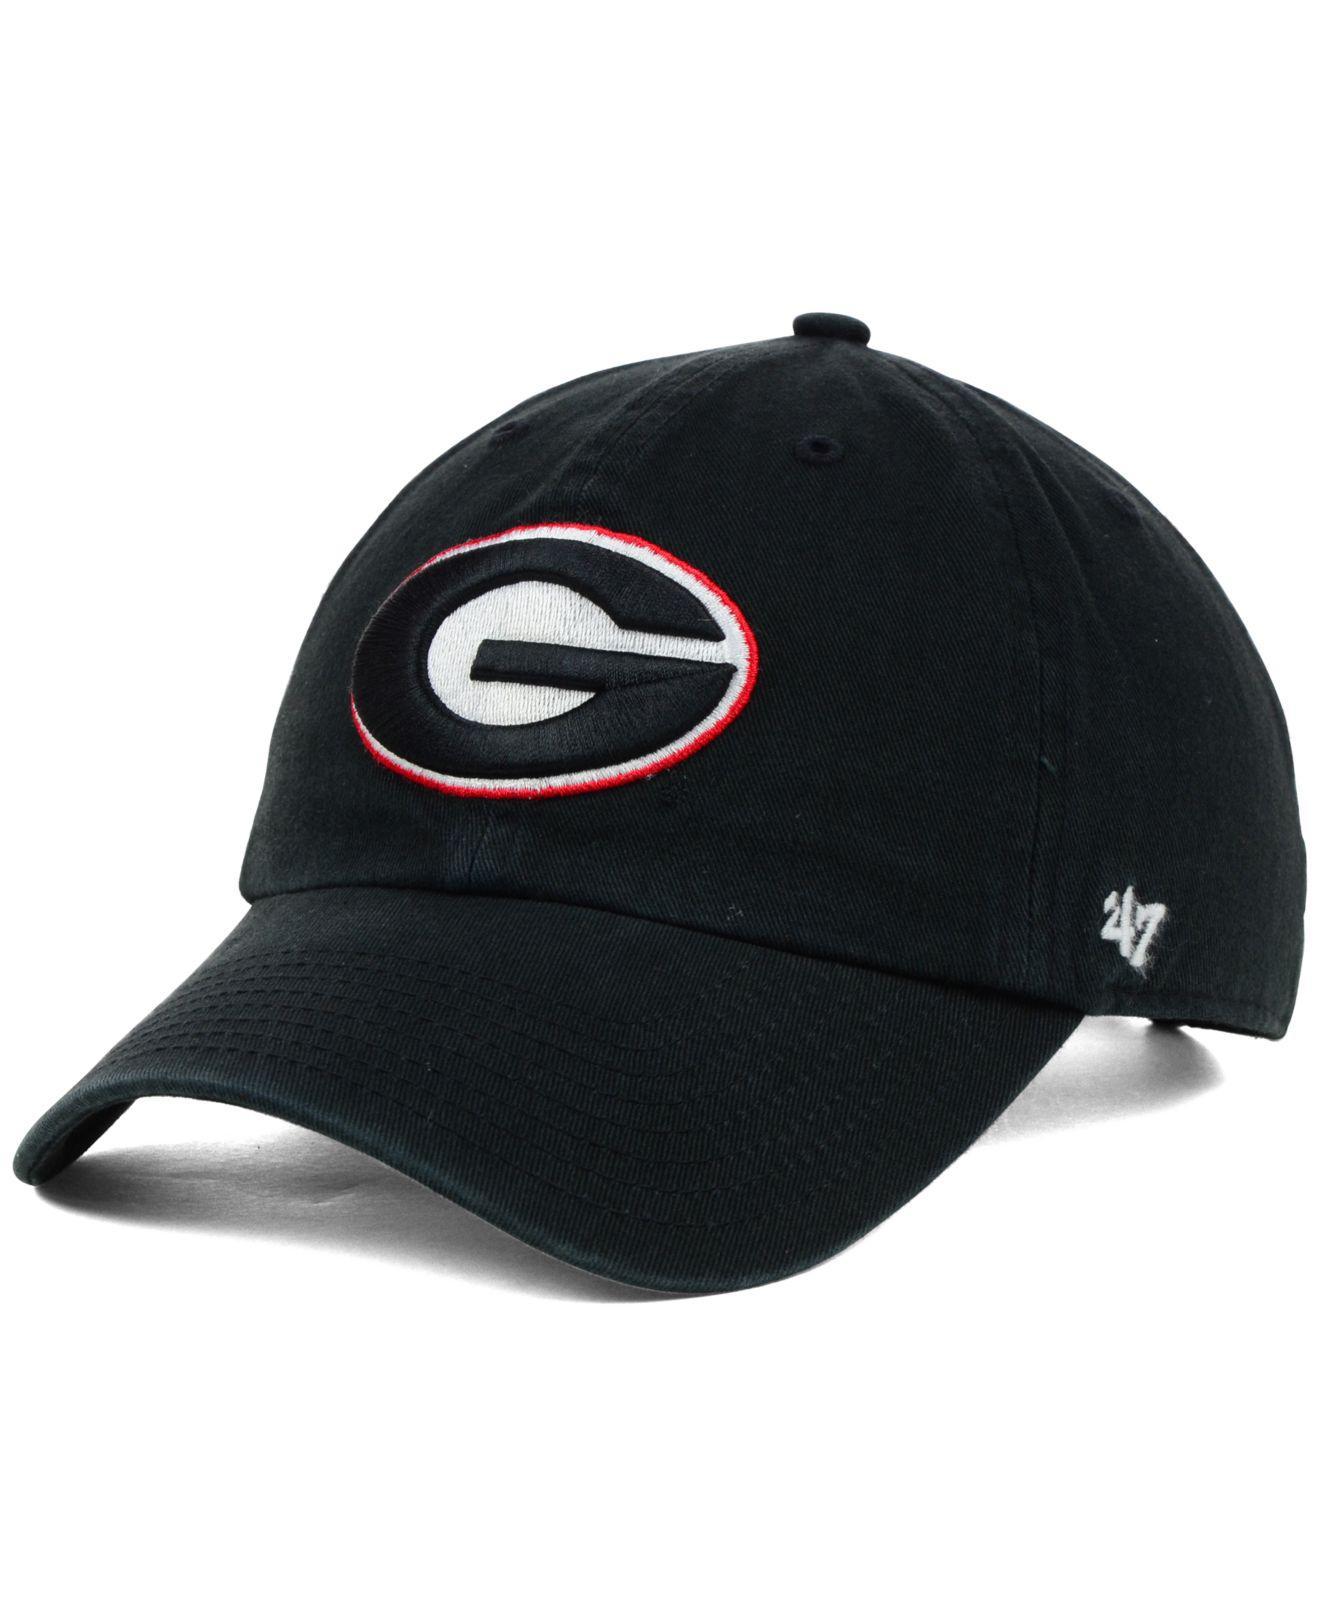 846503f0f61 Lyst - 47 Brand Georgia Bulldogs Ncaa Clean-up Cap in Black for Men